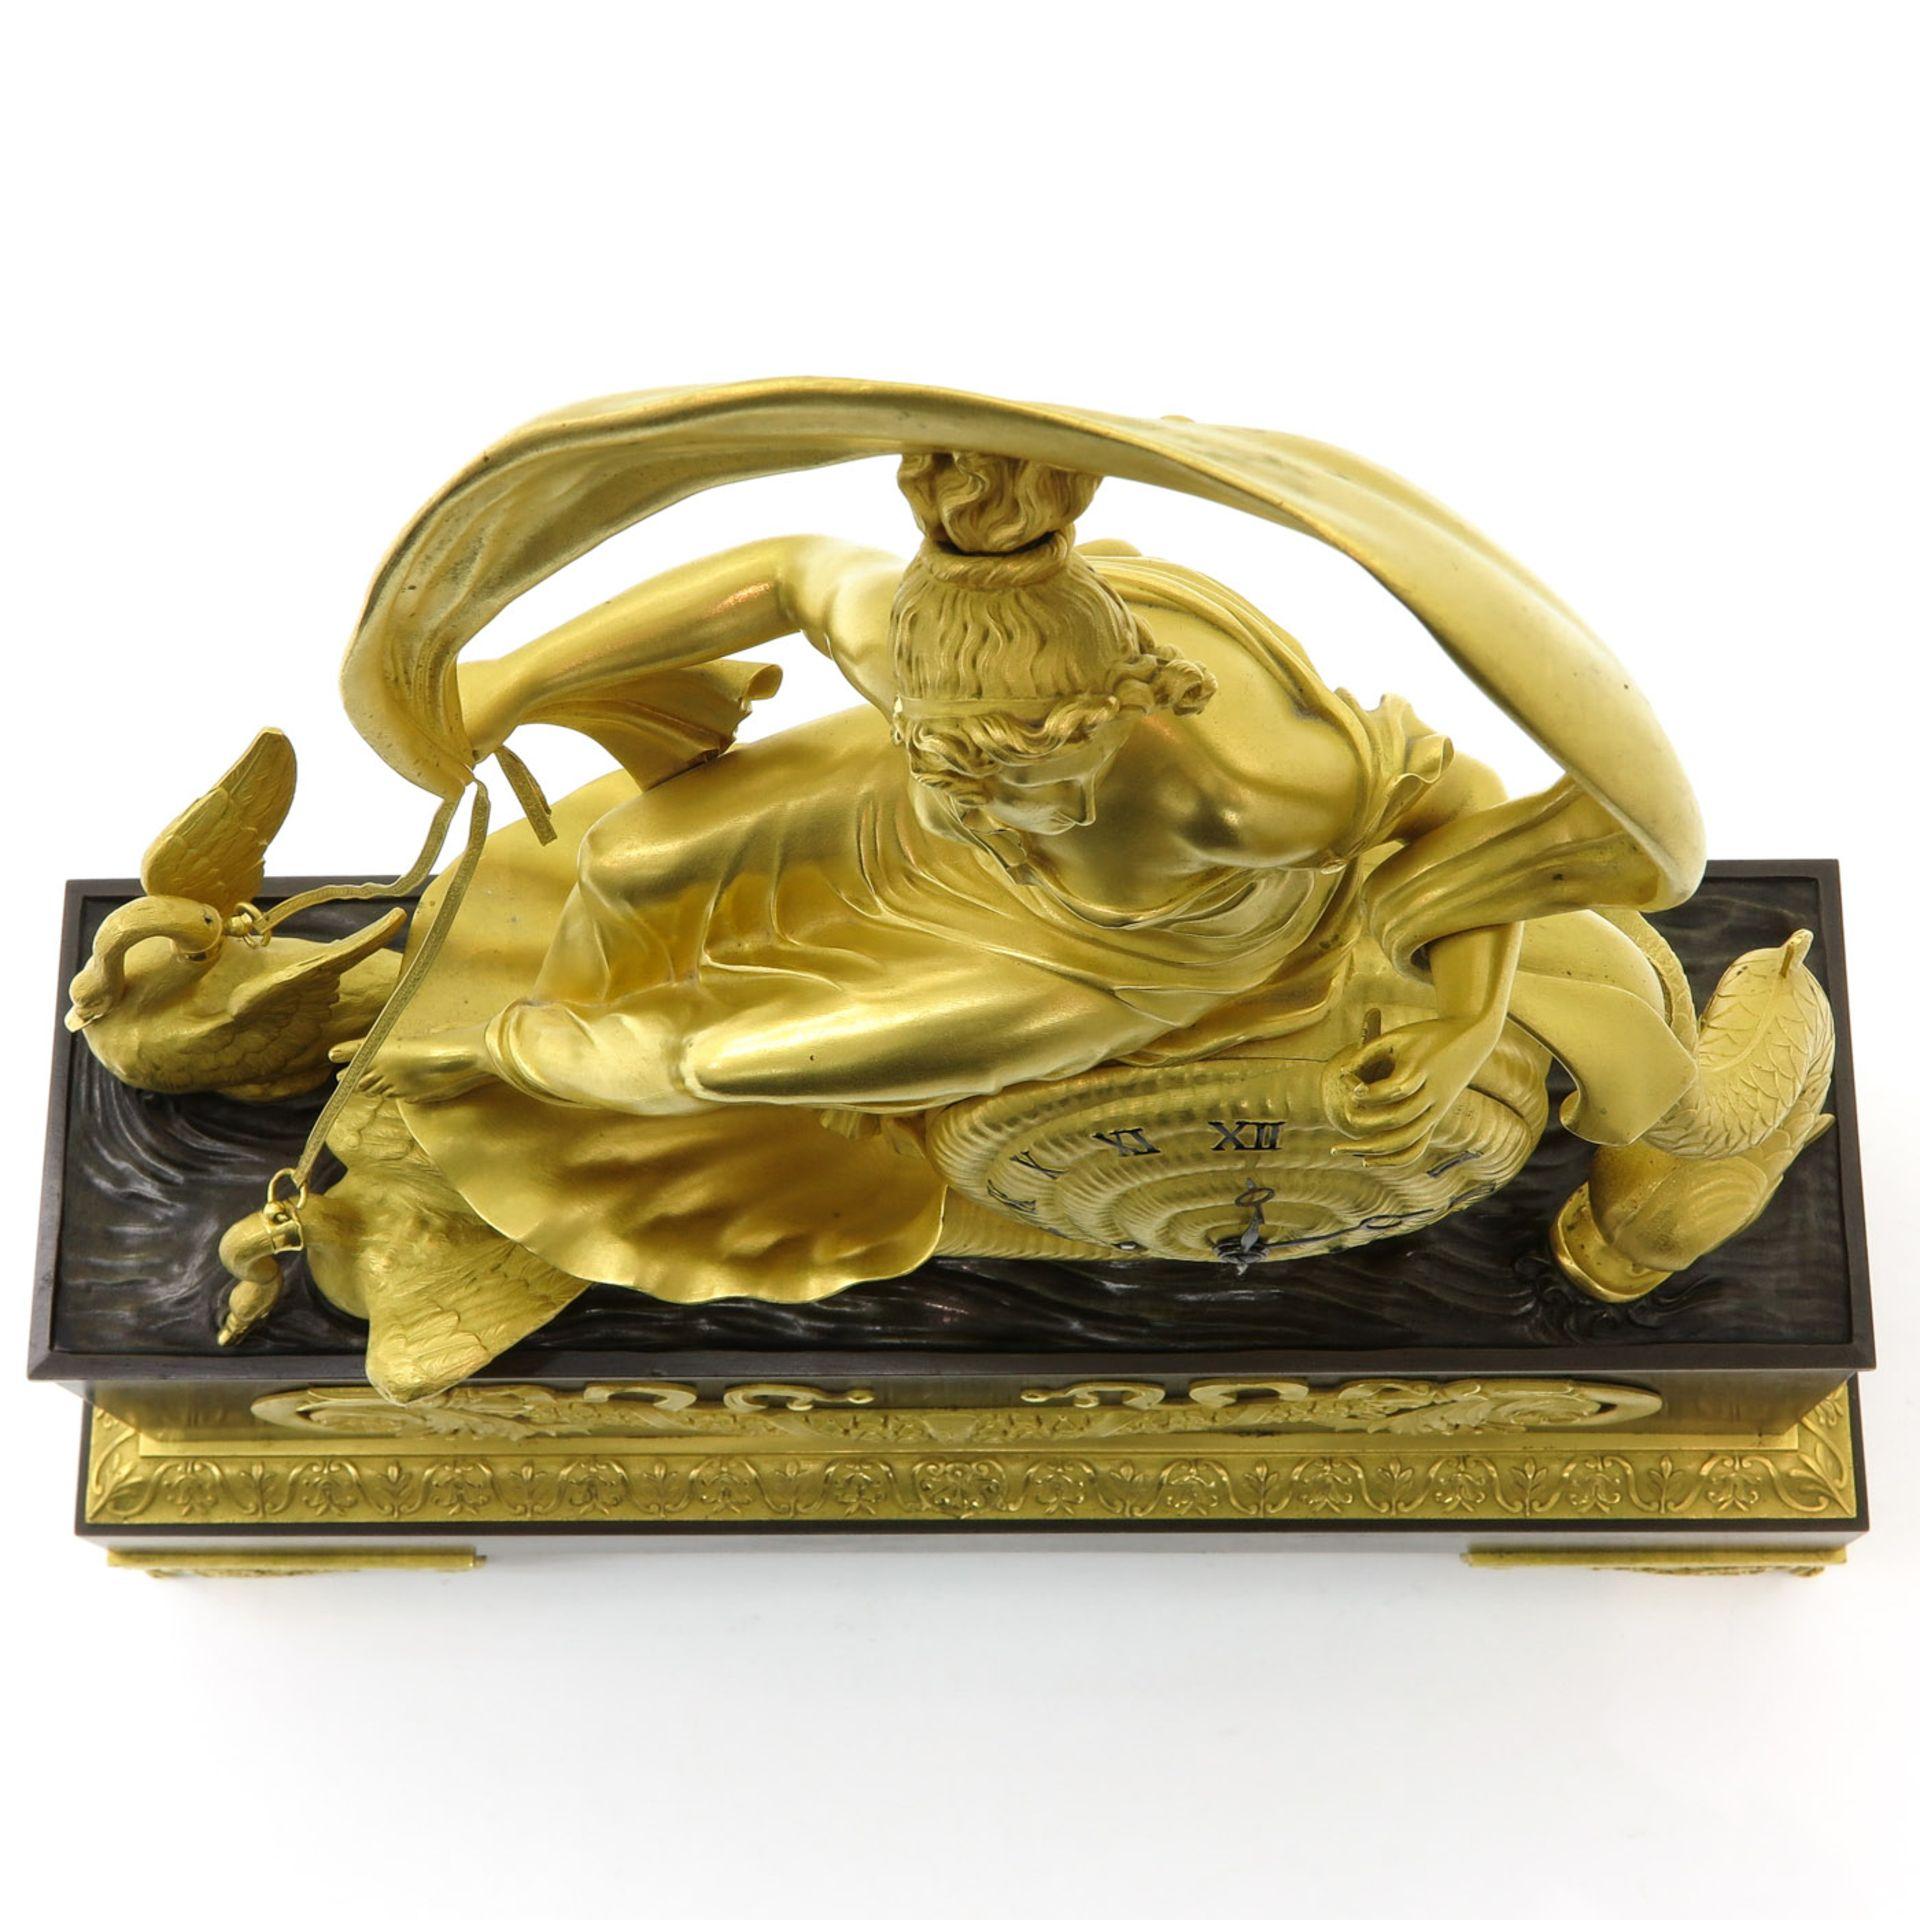 Los 1020 - A Gilded Bronze Empire Pendulum